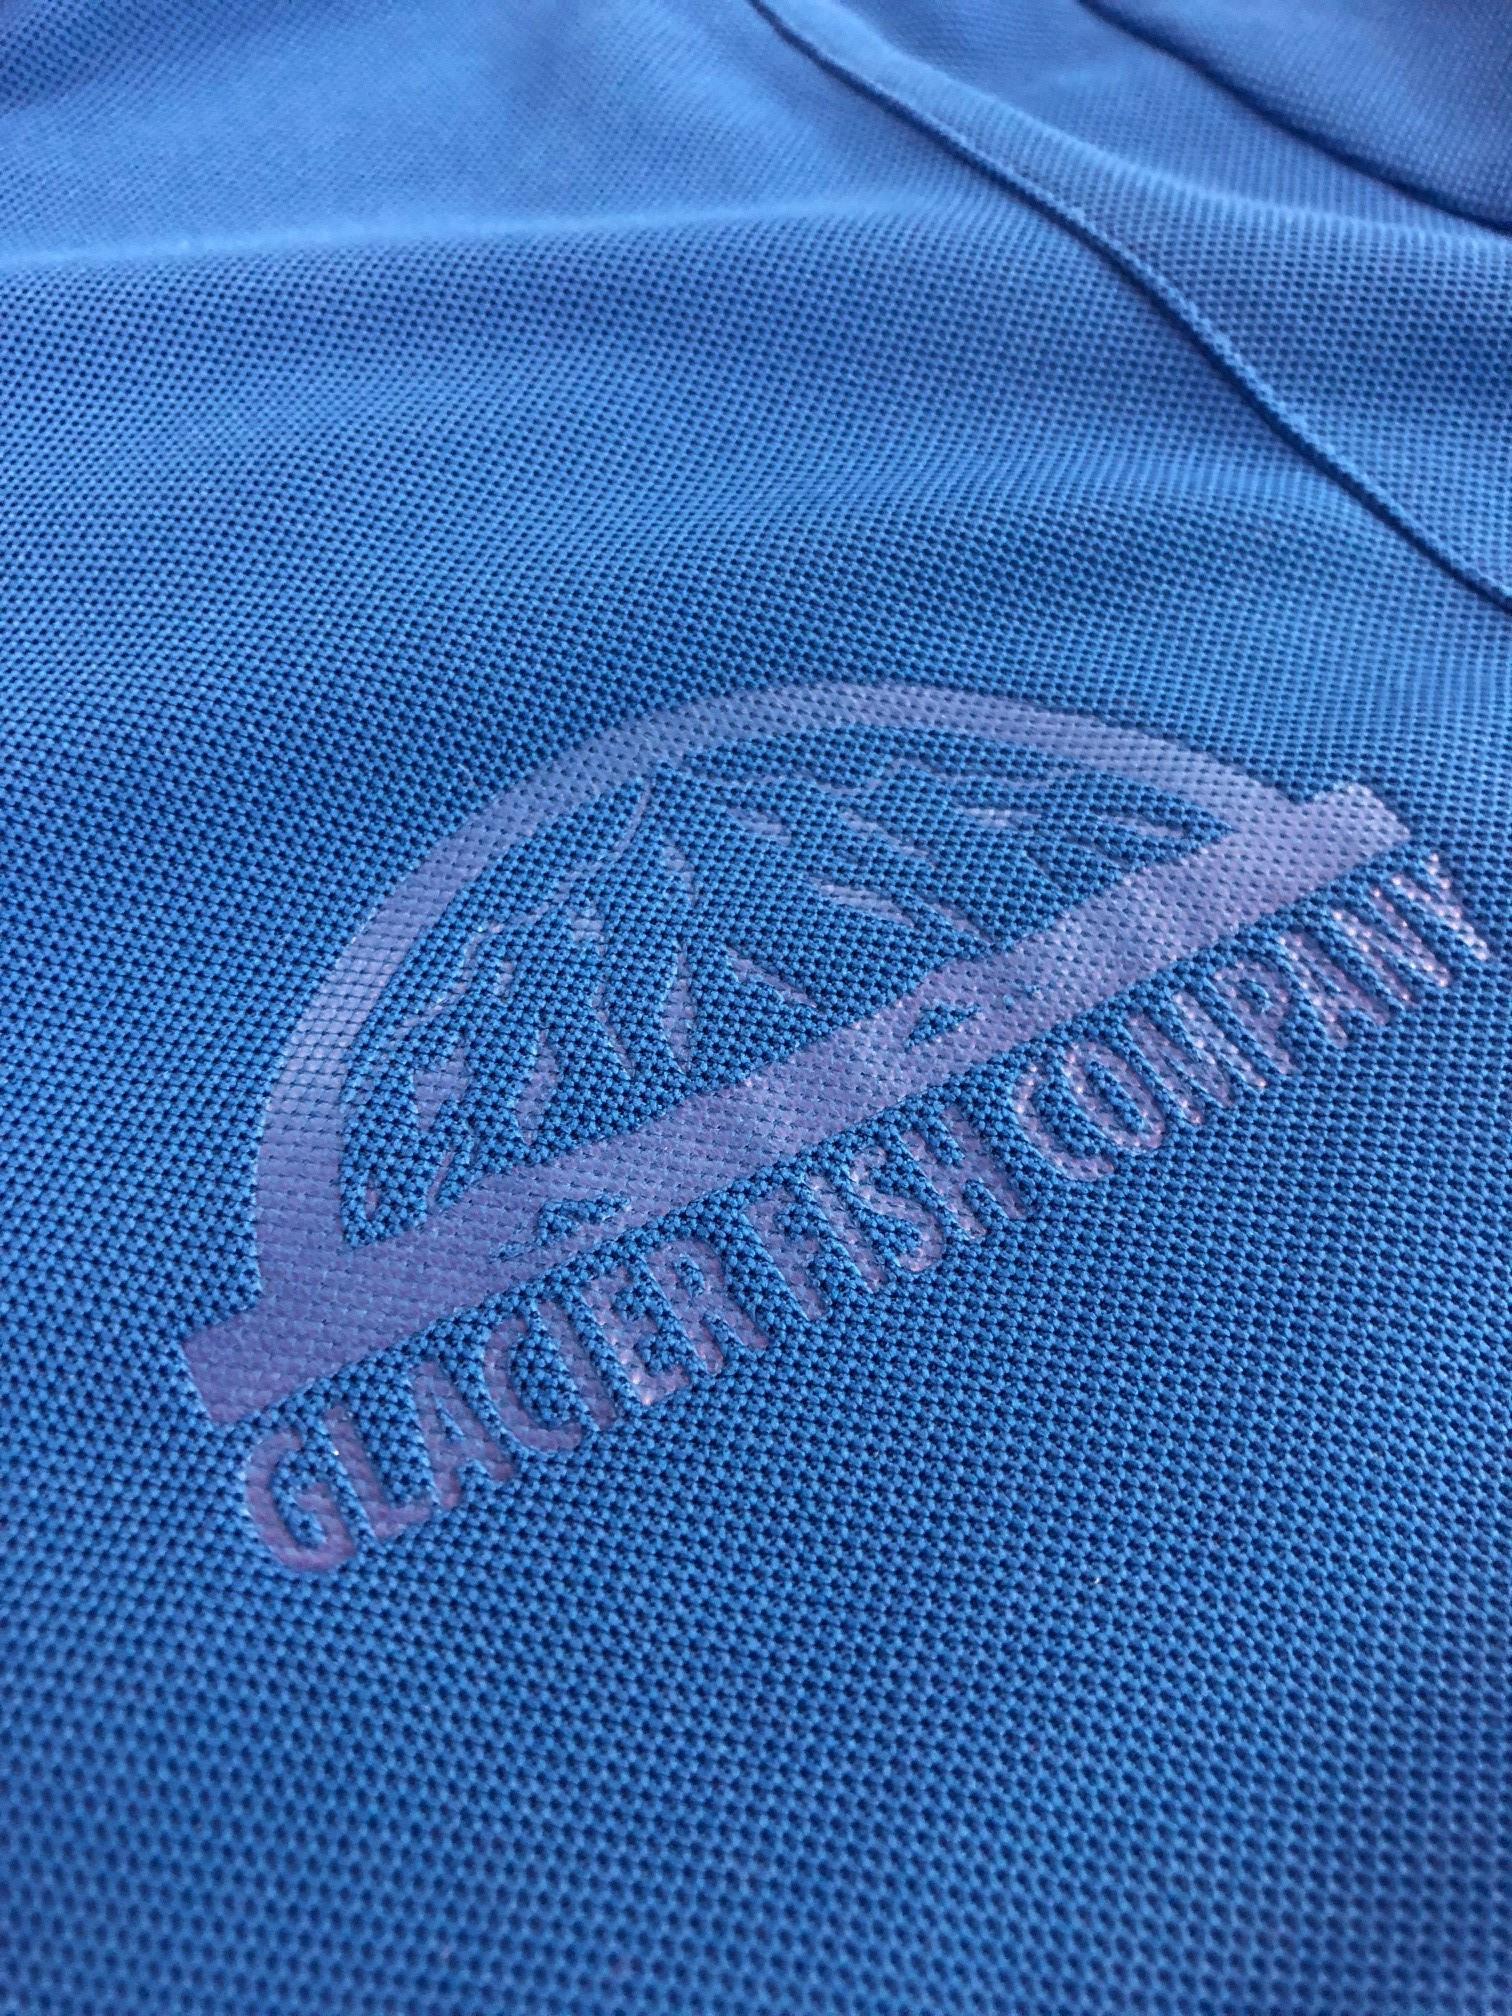 logounltd_laser_etching_embroidery_screen_printing_apparel_uniform_custom_tshirts_dye_sublimation_kirkland_bellevue_seattle_redmond_branded_merchandise_promotional_products_logo_unltd_glacier_fish_alaska_fishing.jpg